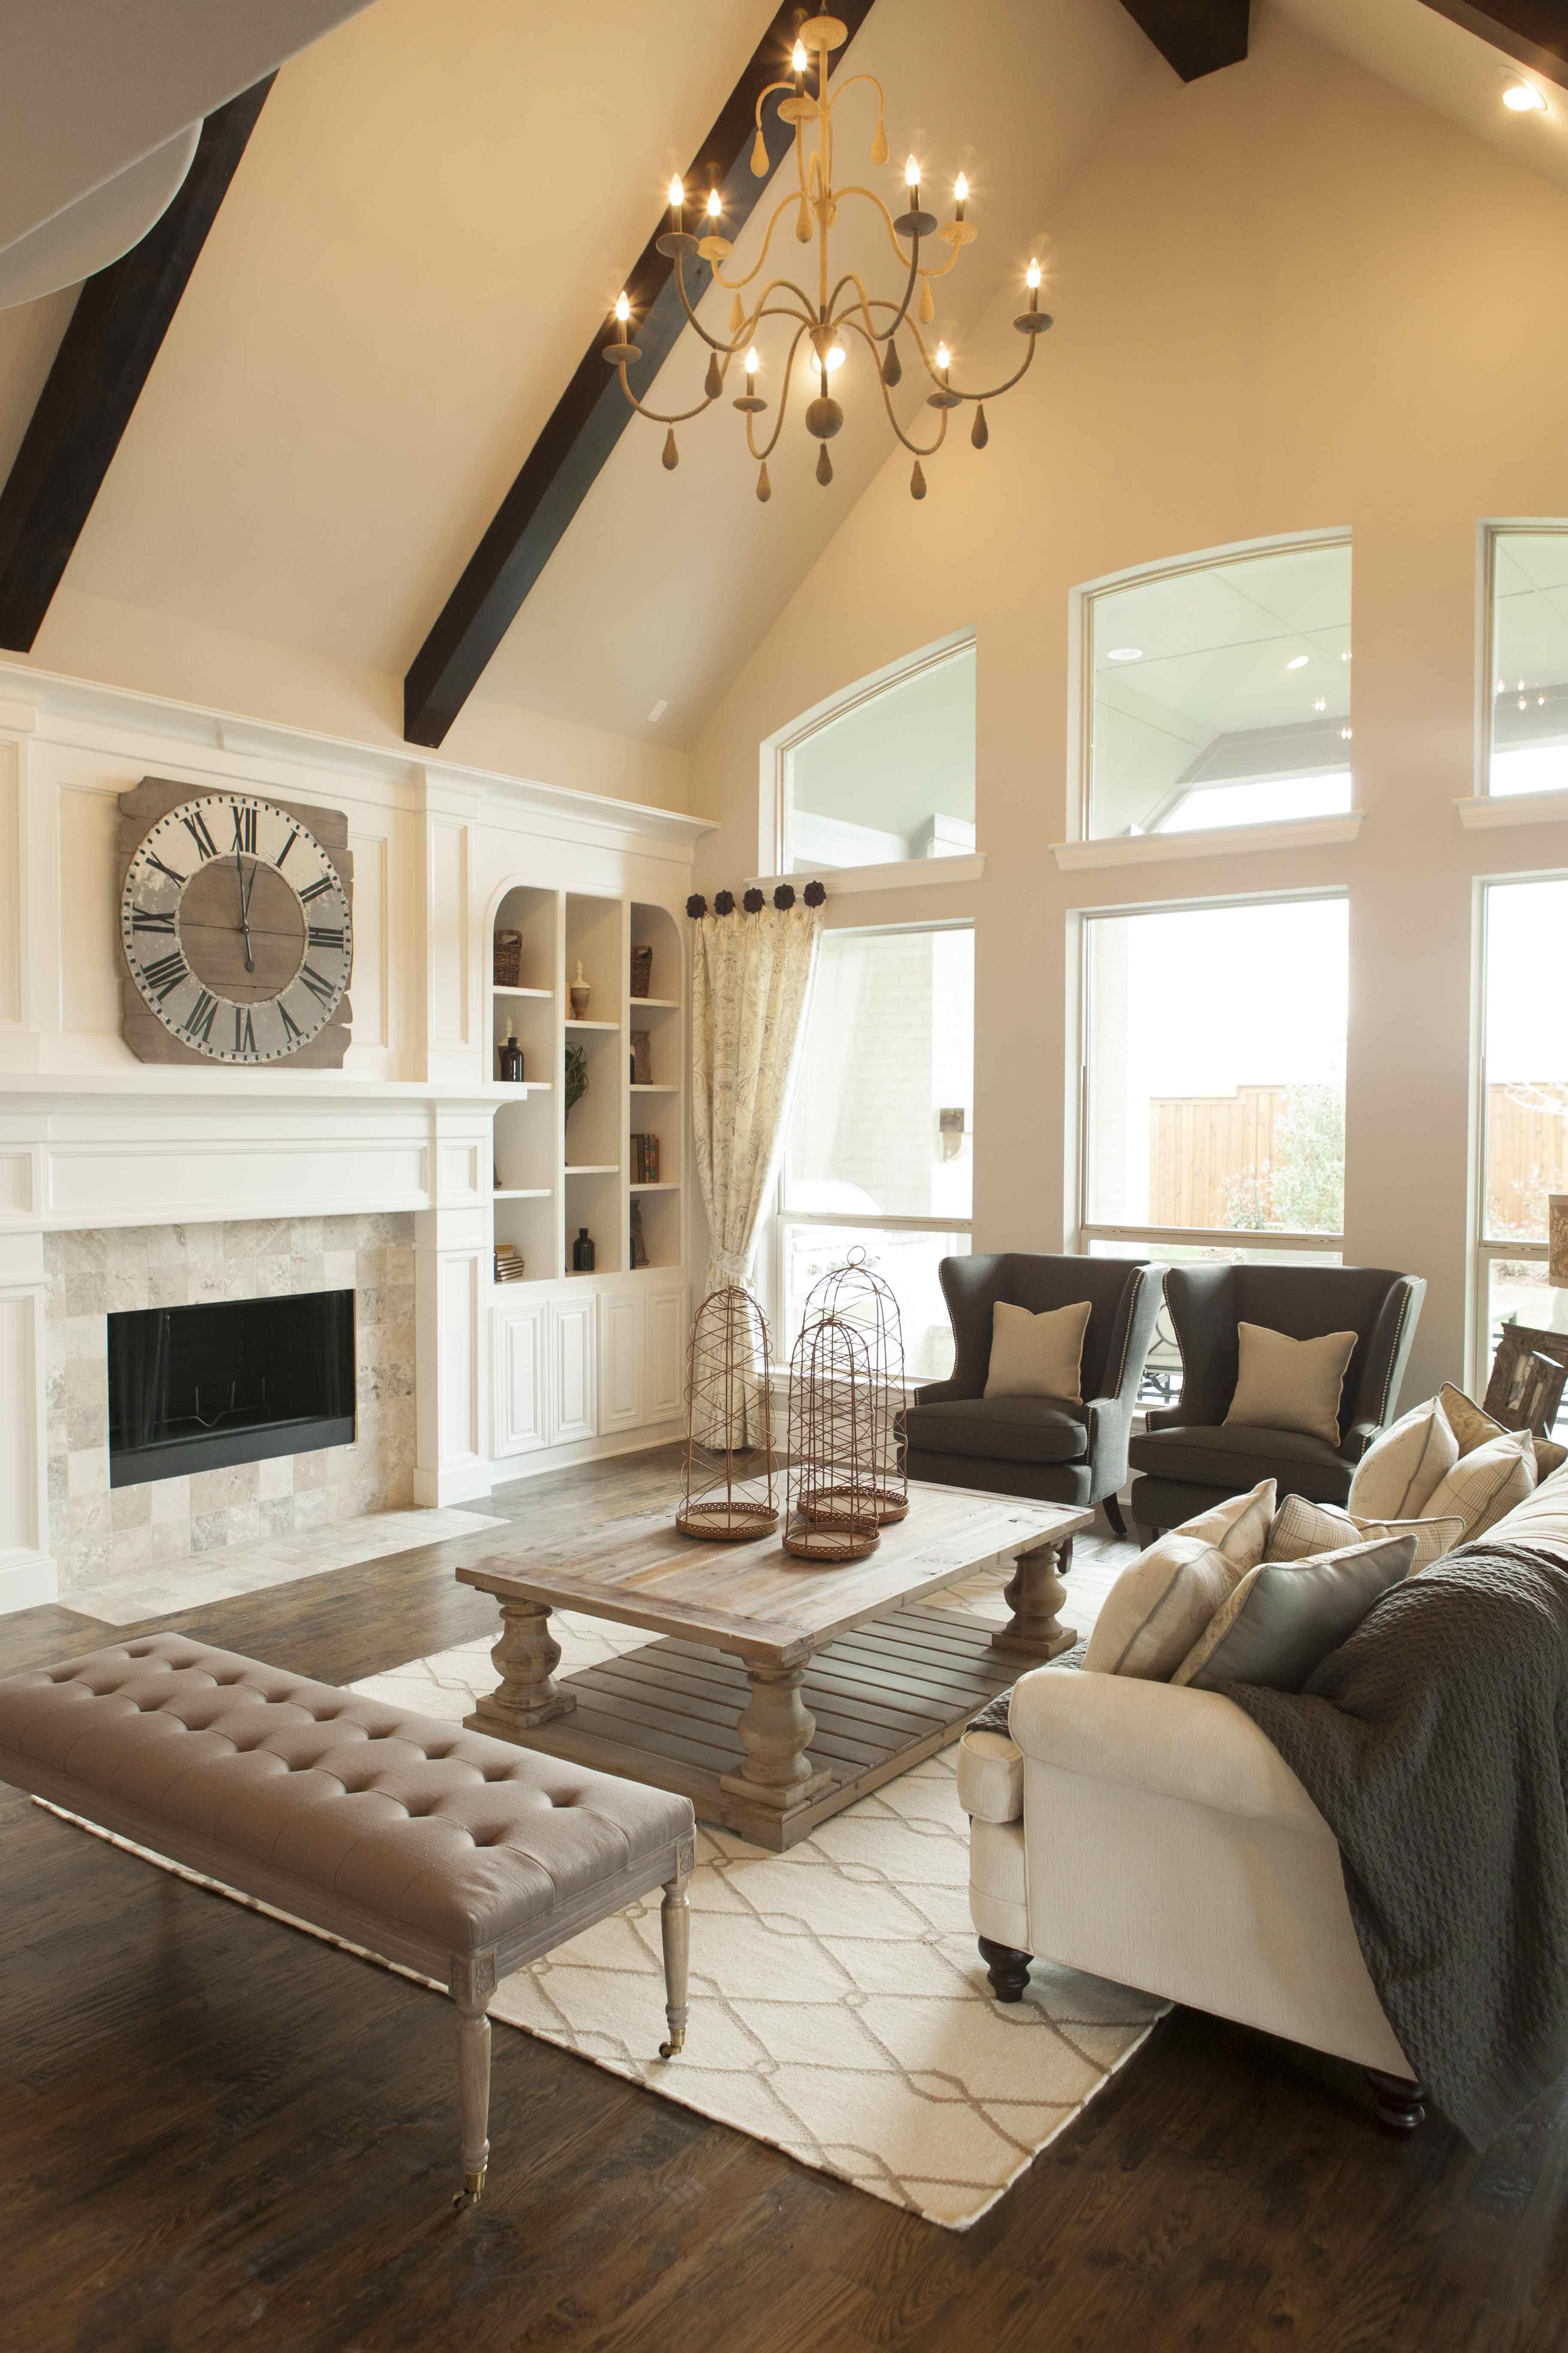 Warm Inviting Living Room By Shaddock Homes At Phillips Creek Ranch Shaddockhomestx Livingroom